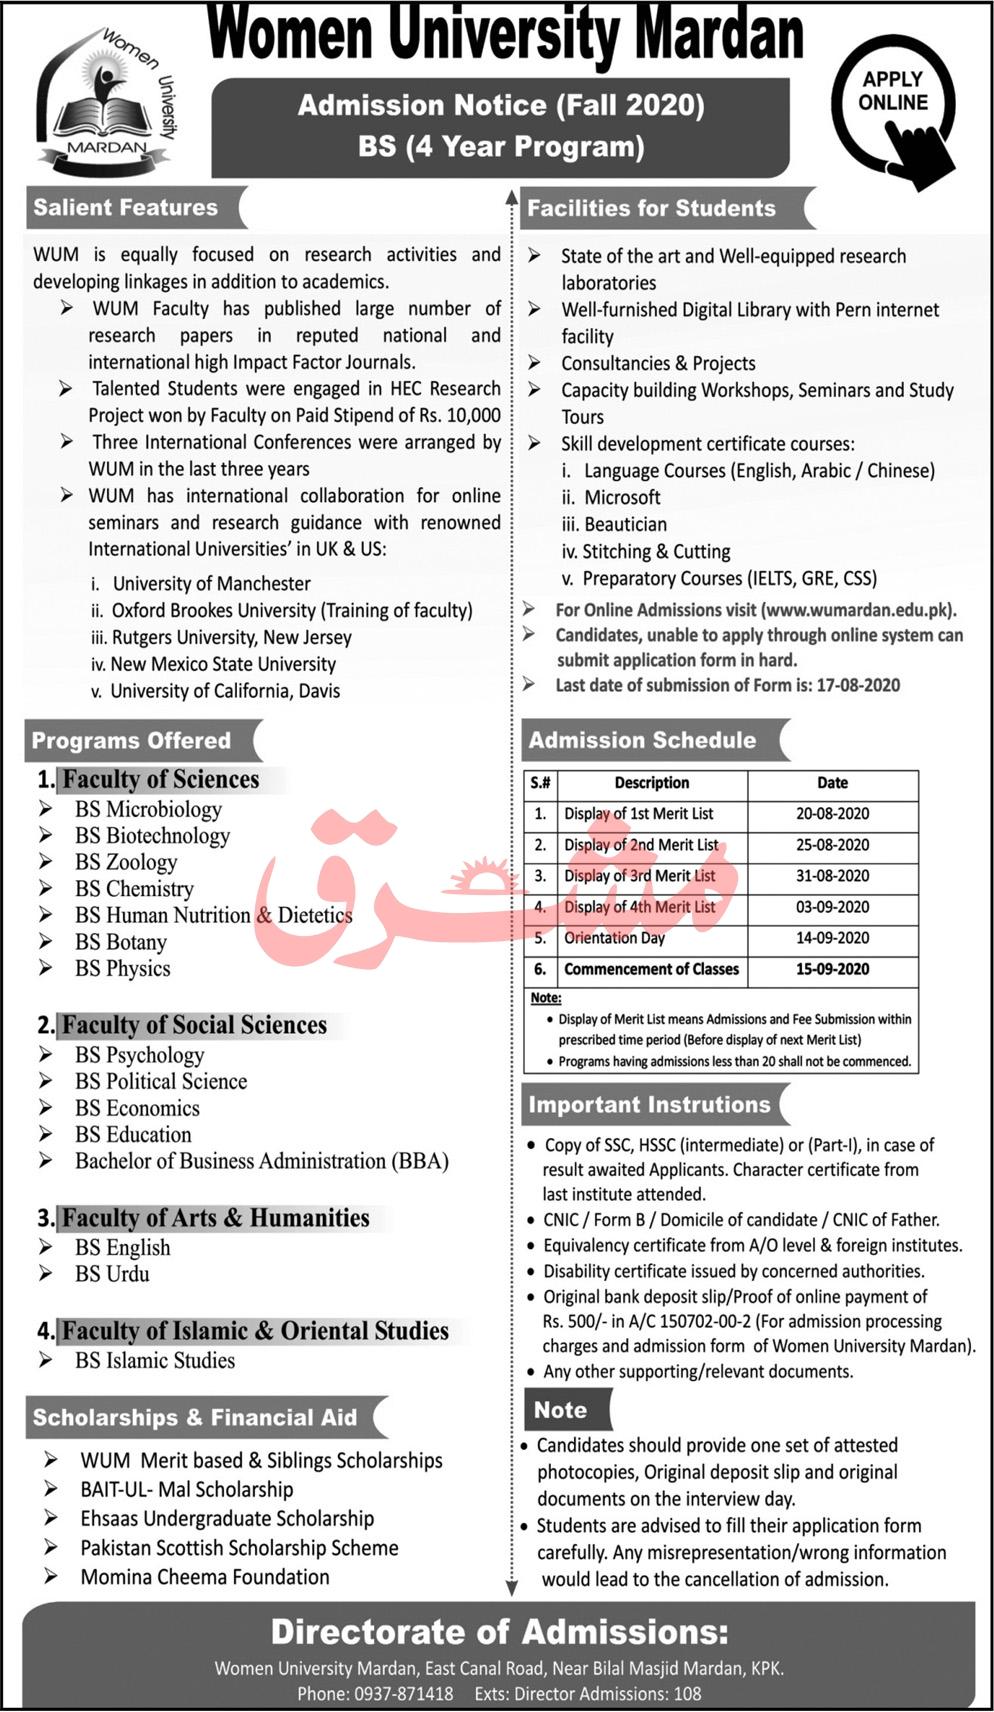 Women University Mardan Admission 2020 Form